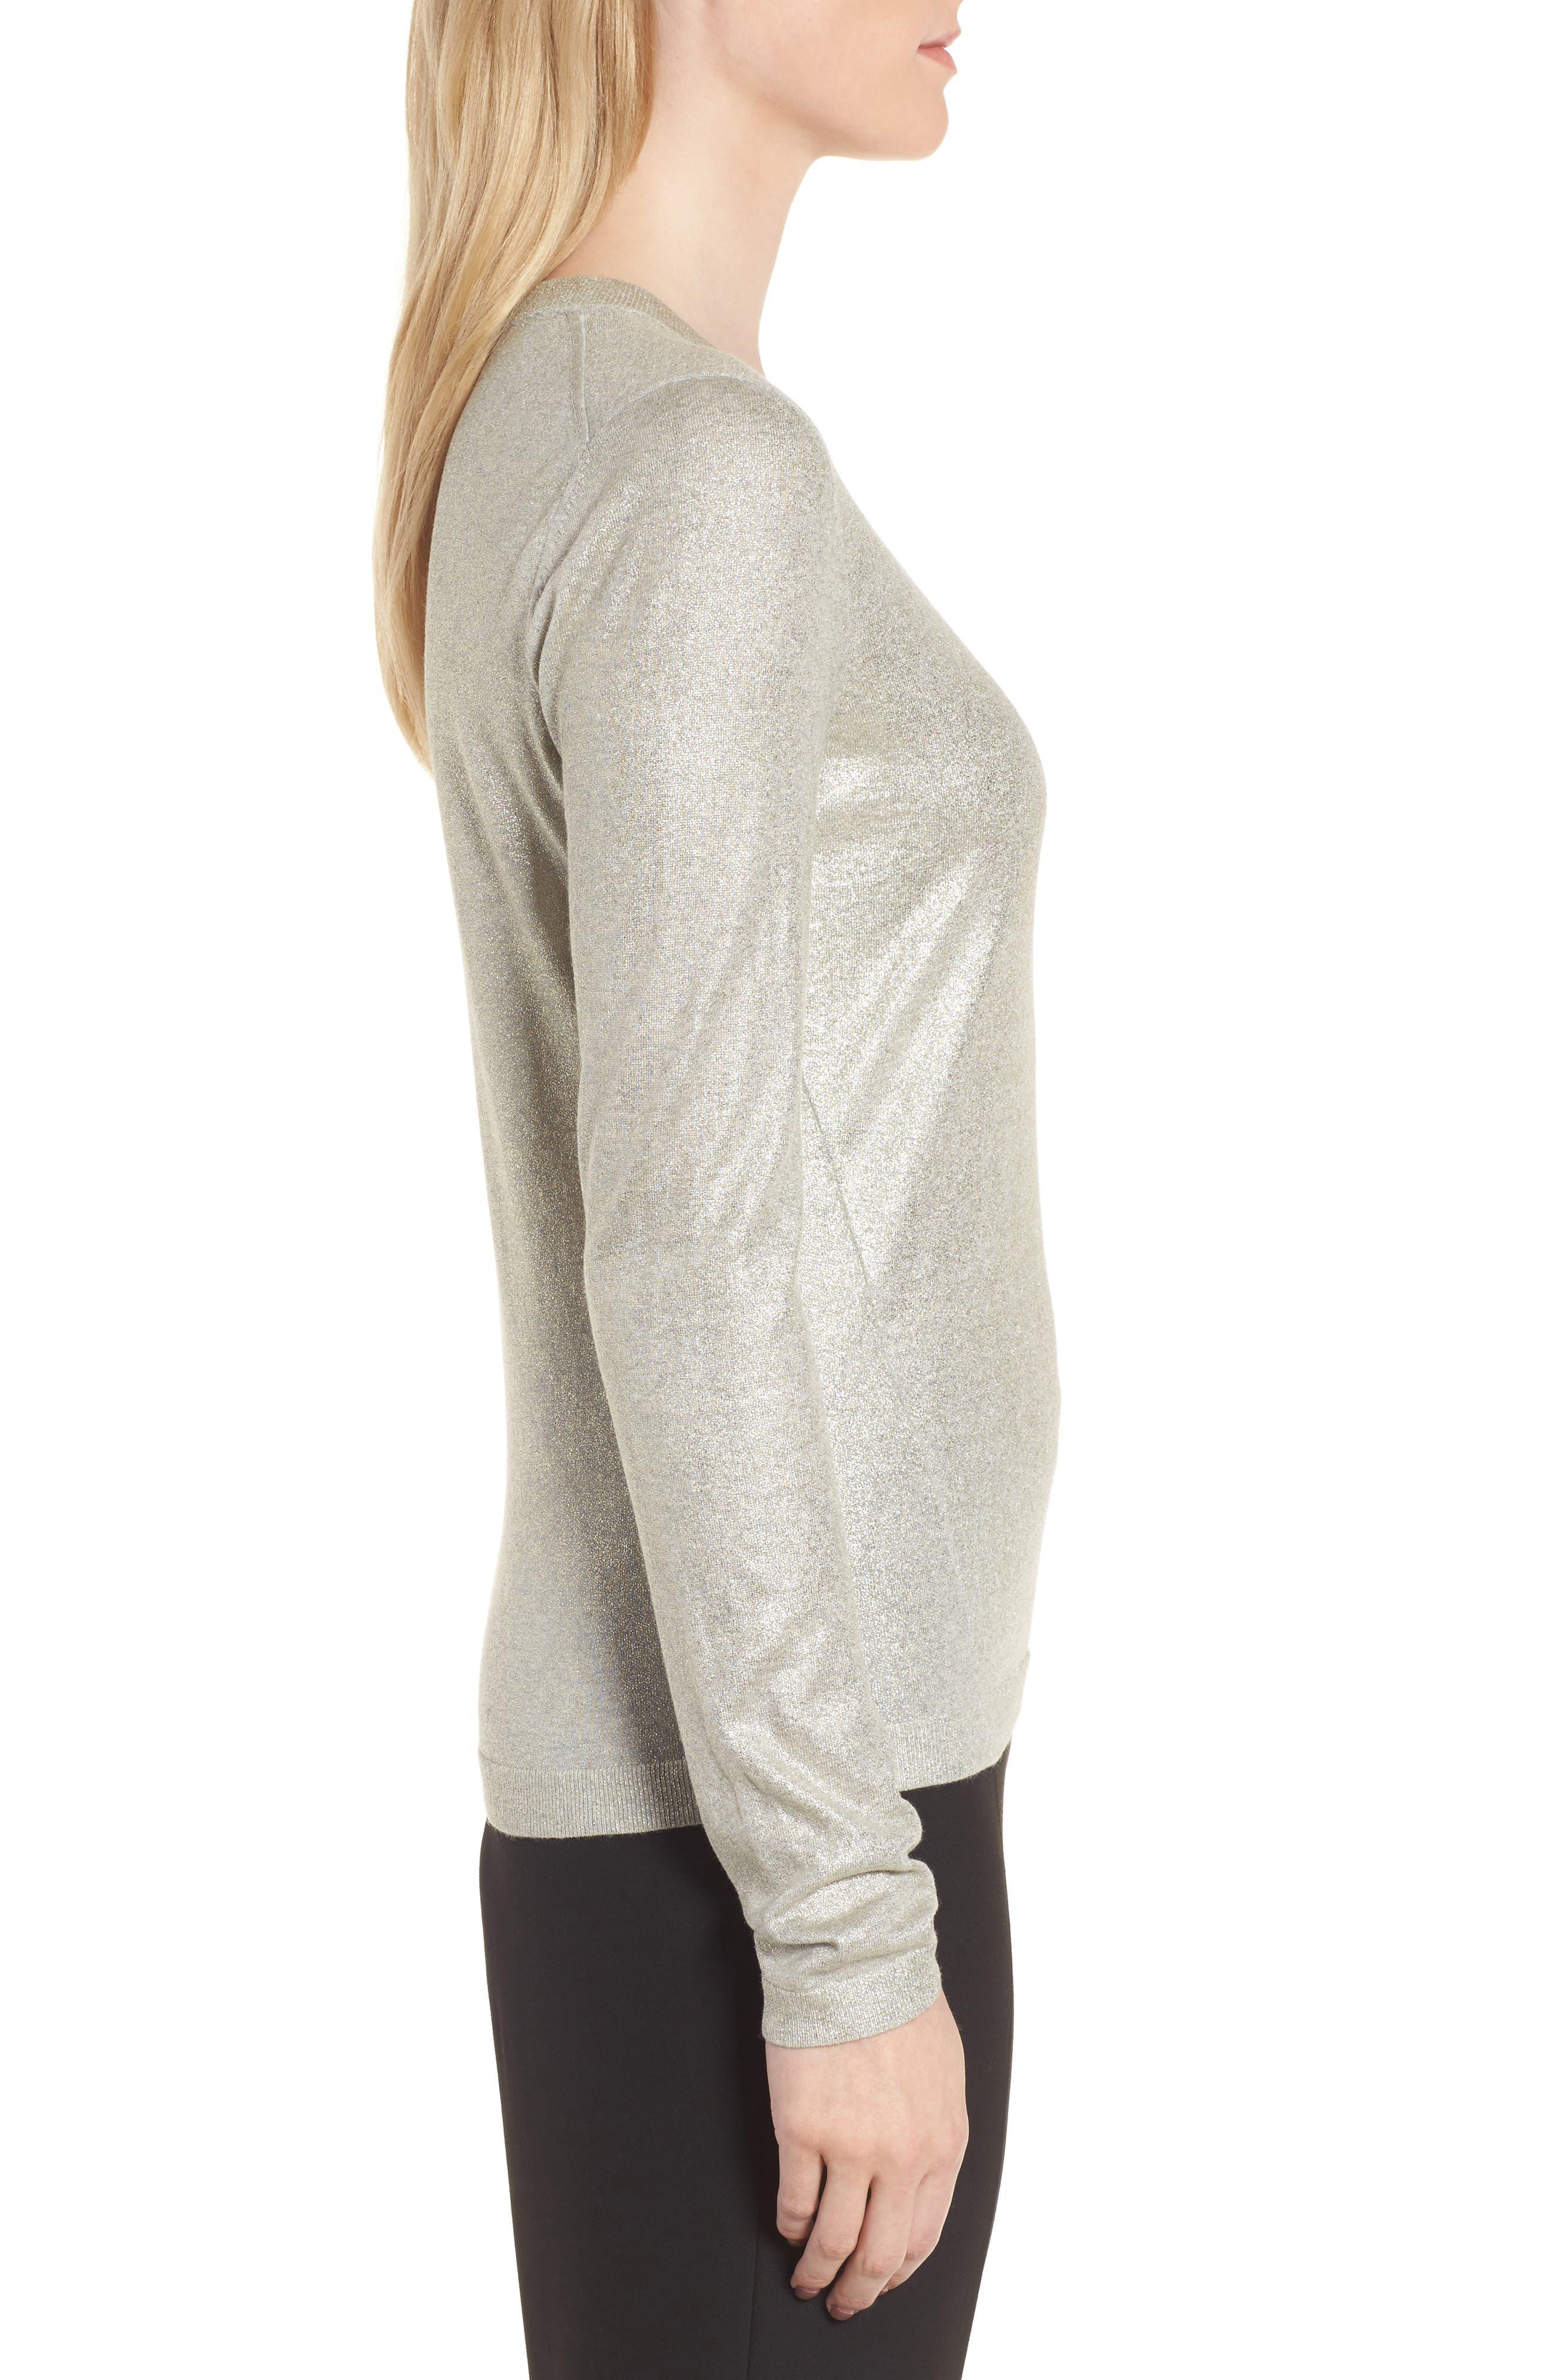 Fadine Wool Crewneck Sweater,                             Alternate thumbnail 3, color,                             Cozy Grey Melange